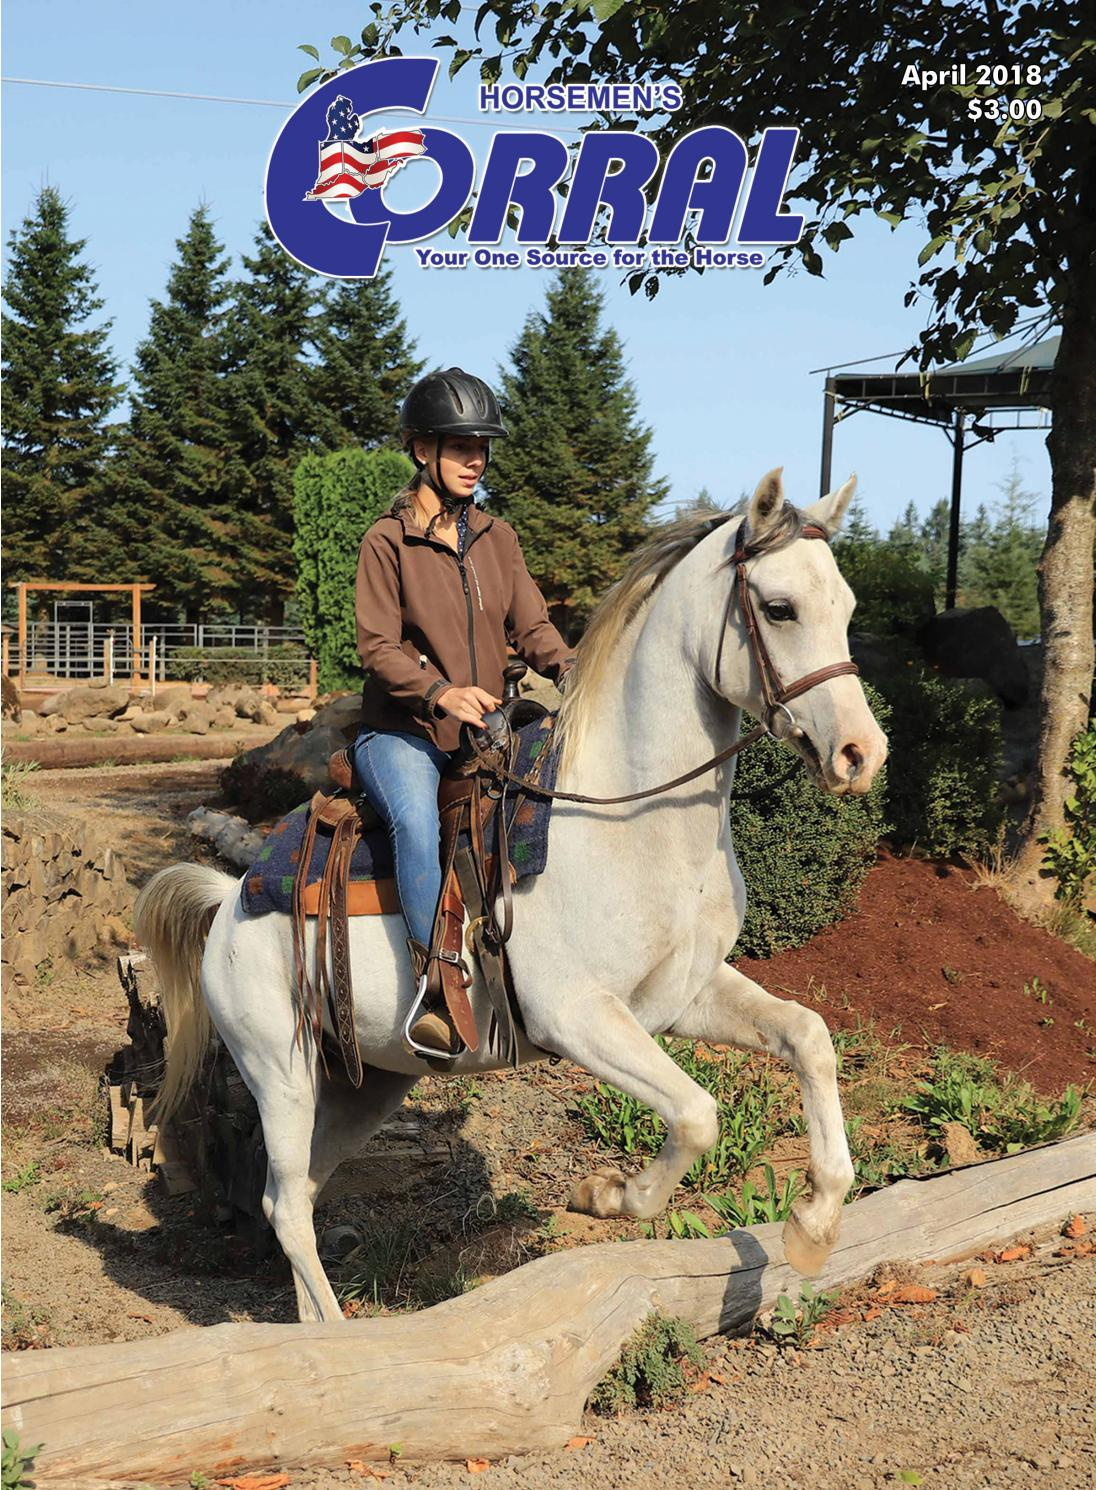 Horsemen's Corral April 2018 by Horsemen's Corral - issuu